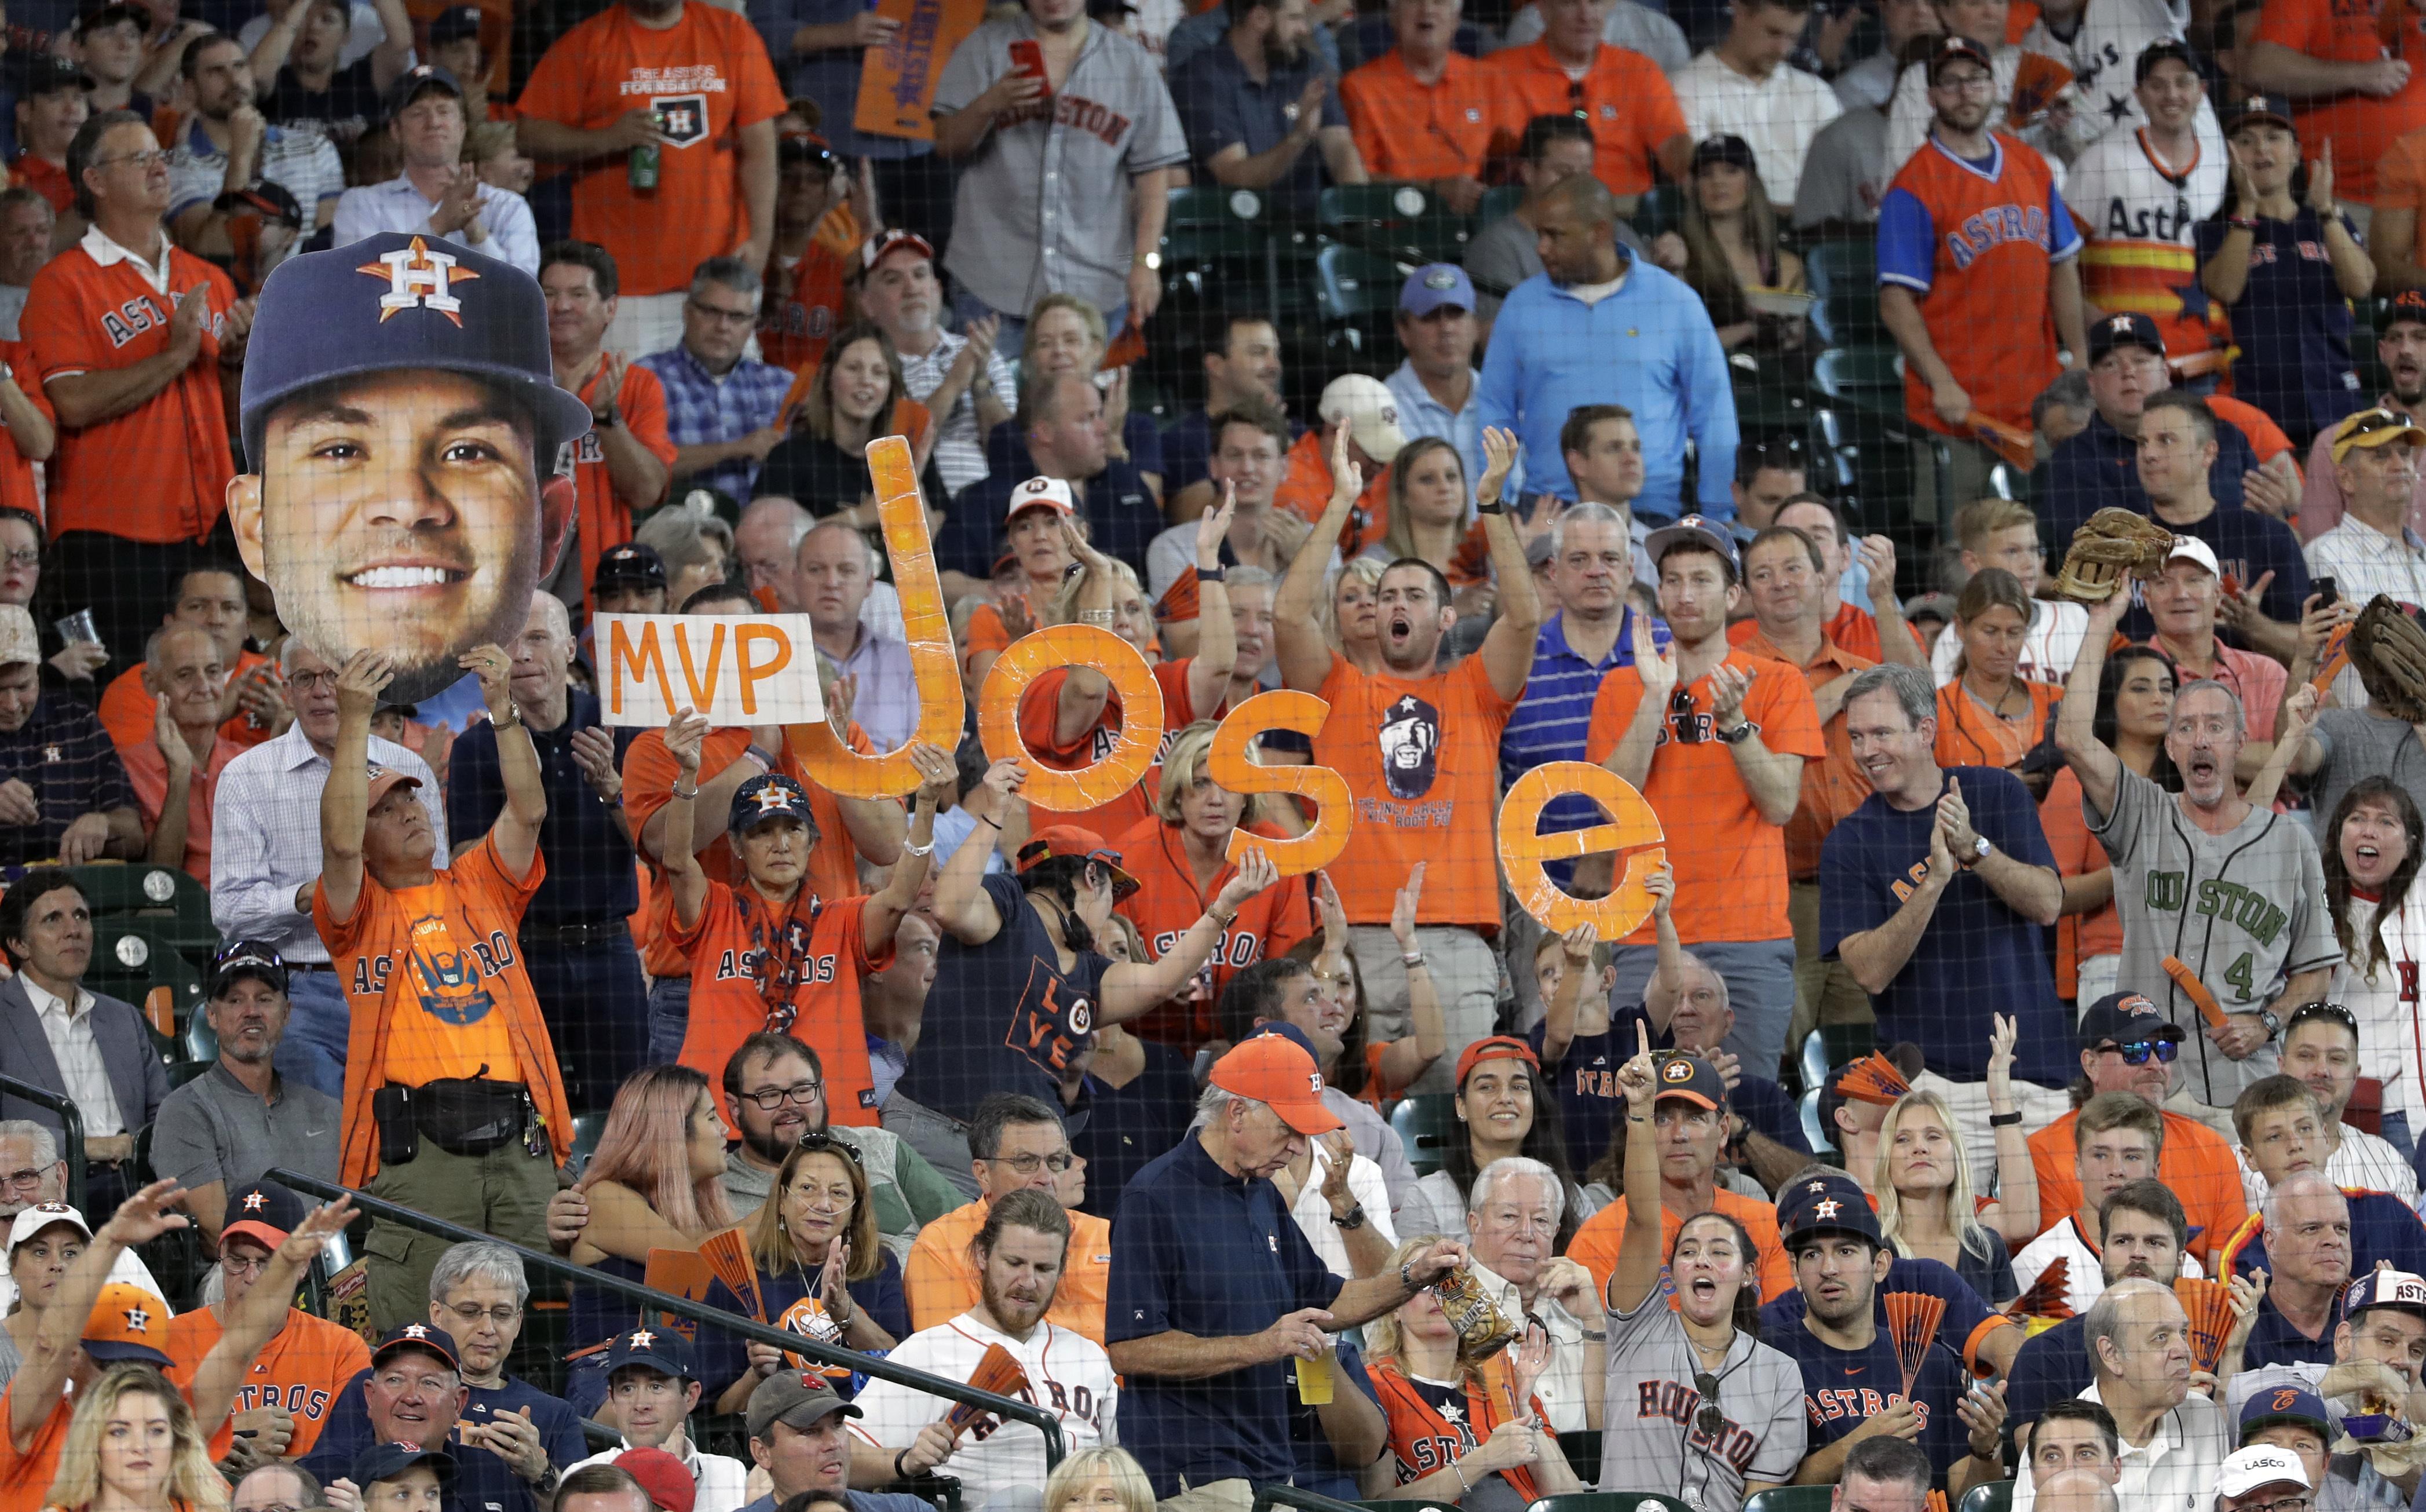 <div class='meta'><div class='origin-logo' data-origin='AP'></div><span class='caption-text' data-credit='David J. Phillip'>Fans cheer for Houston Astros second baseman Jose Altuve (27) during the first inning in Game 2.</span></div>